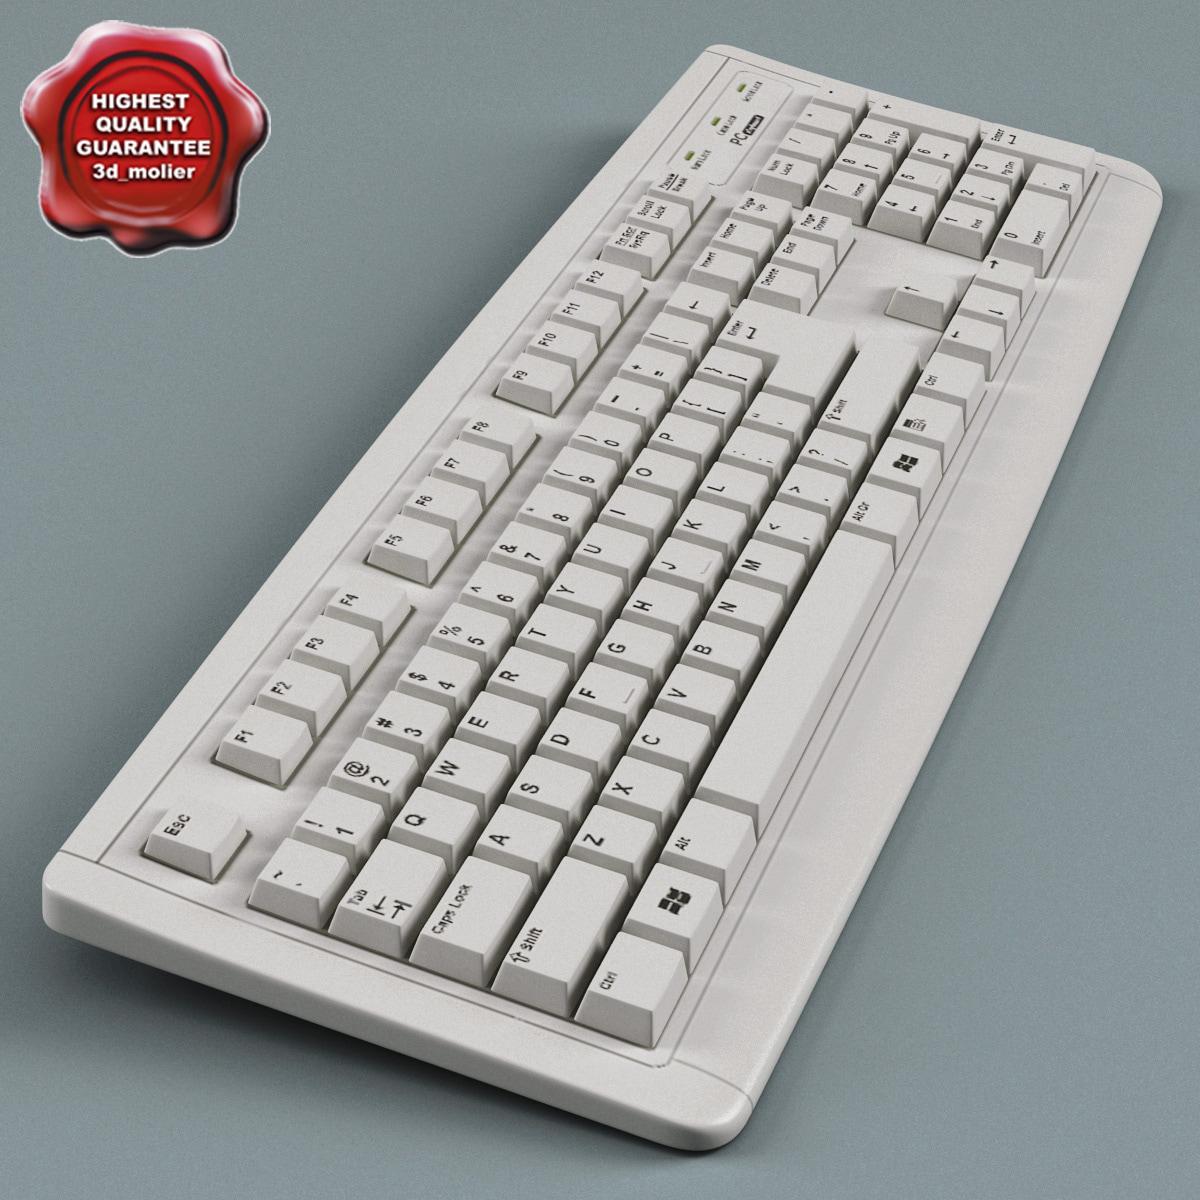 Keyboard_Low_Poly_00.jpg